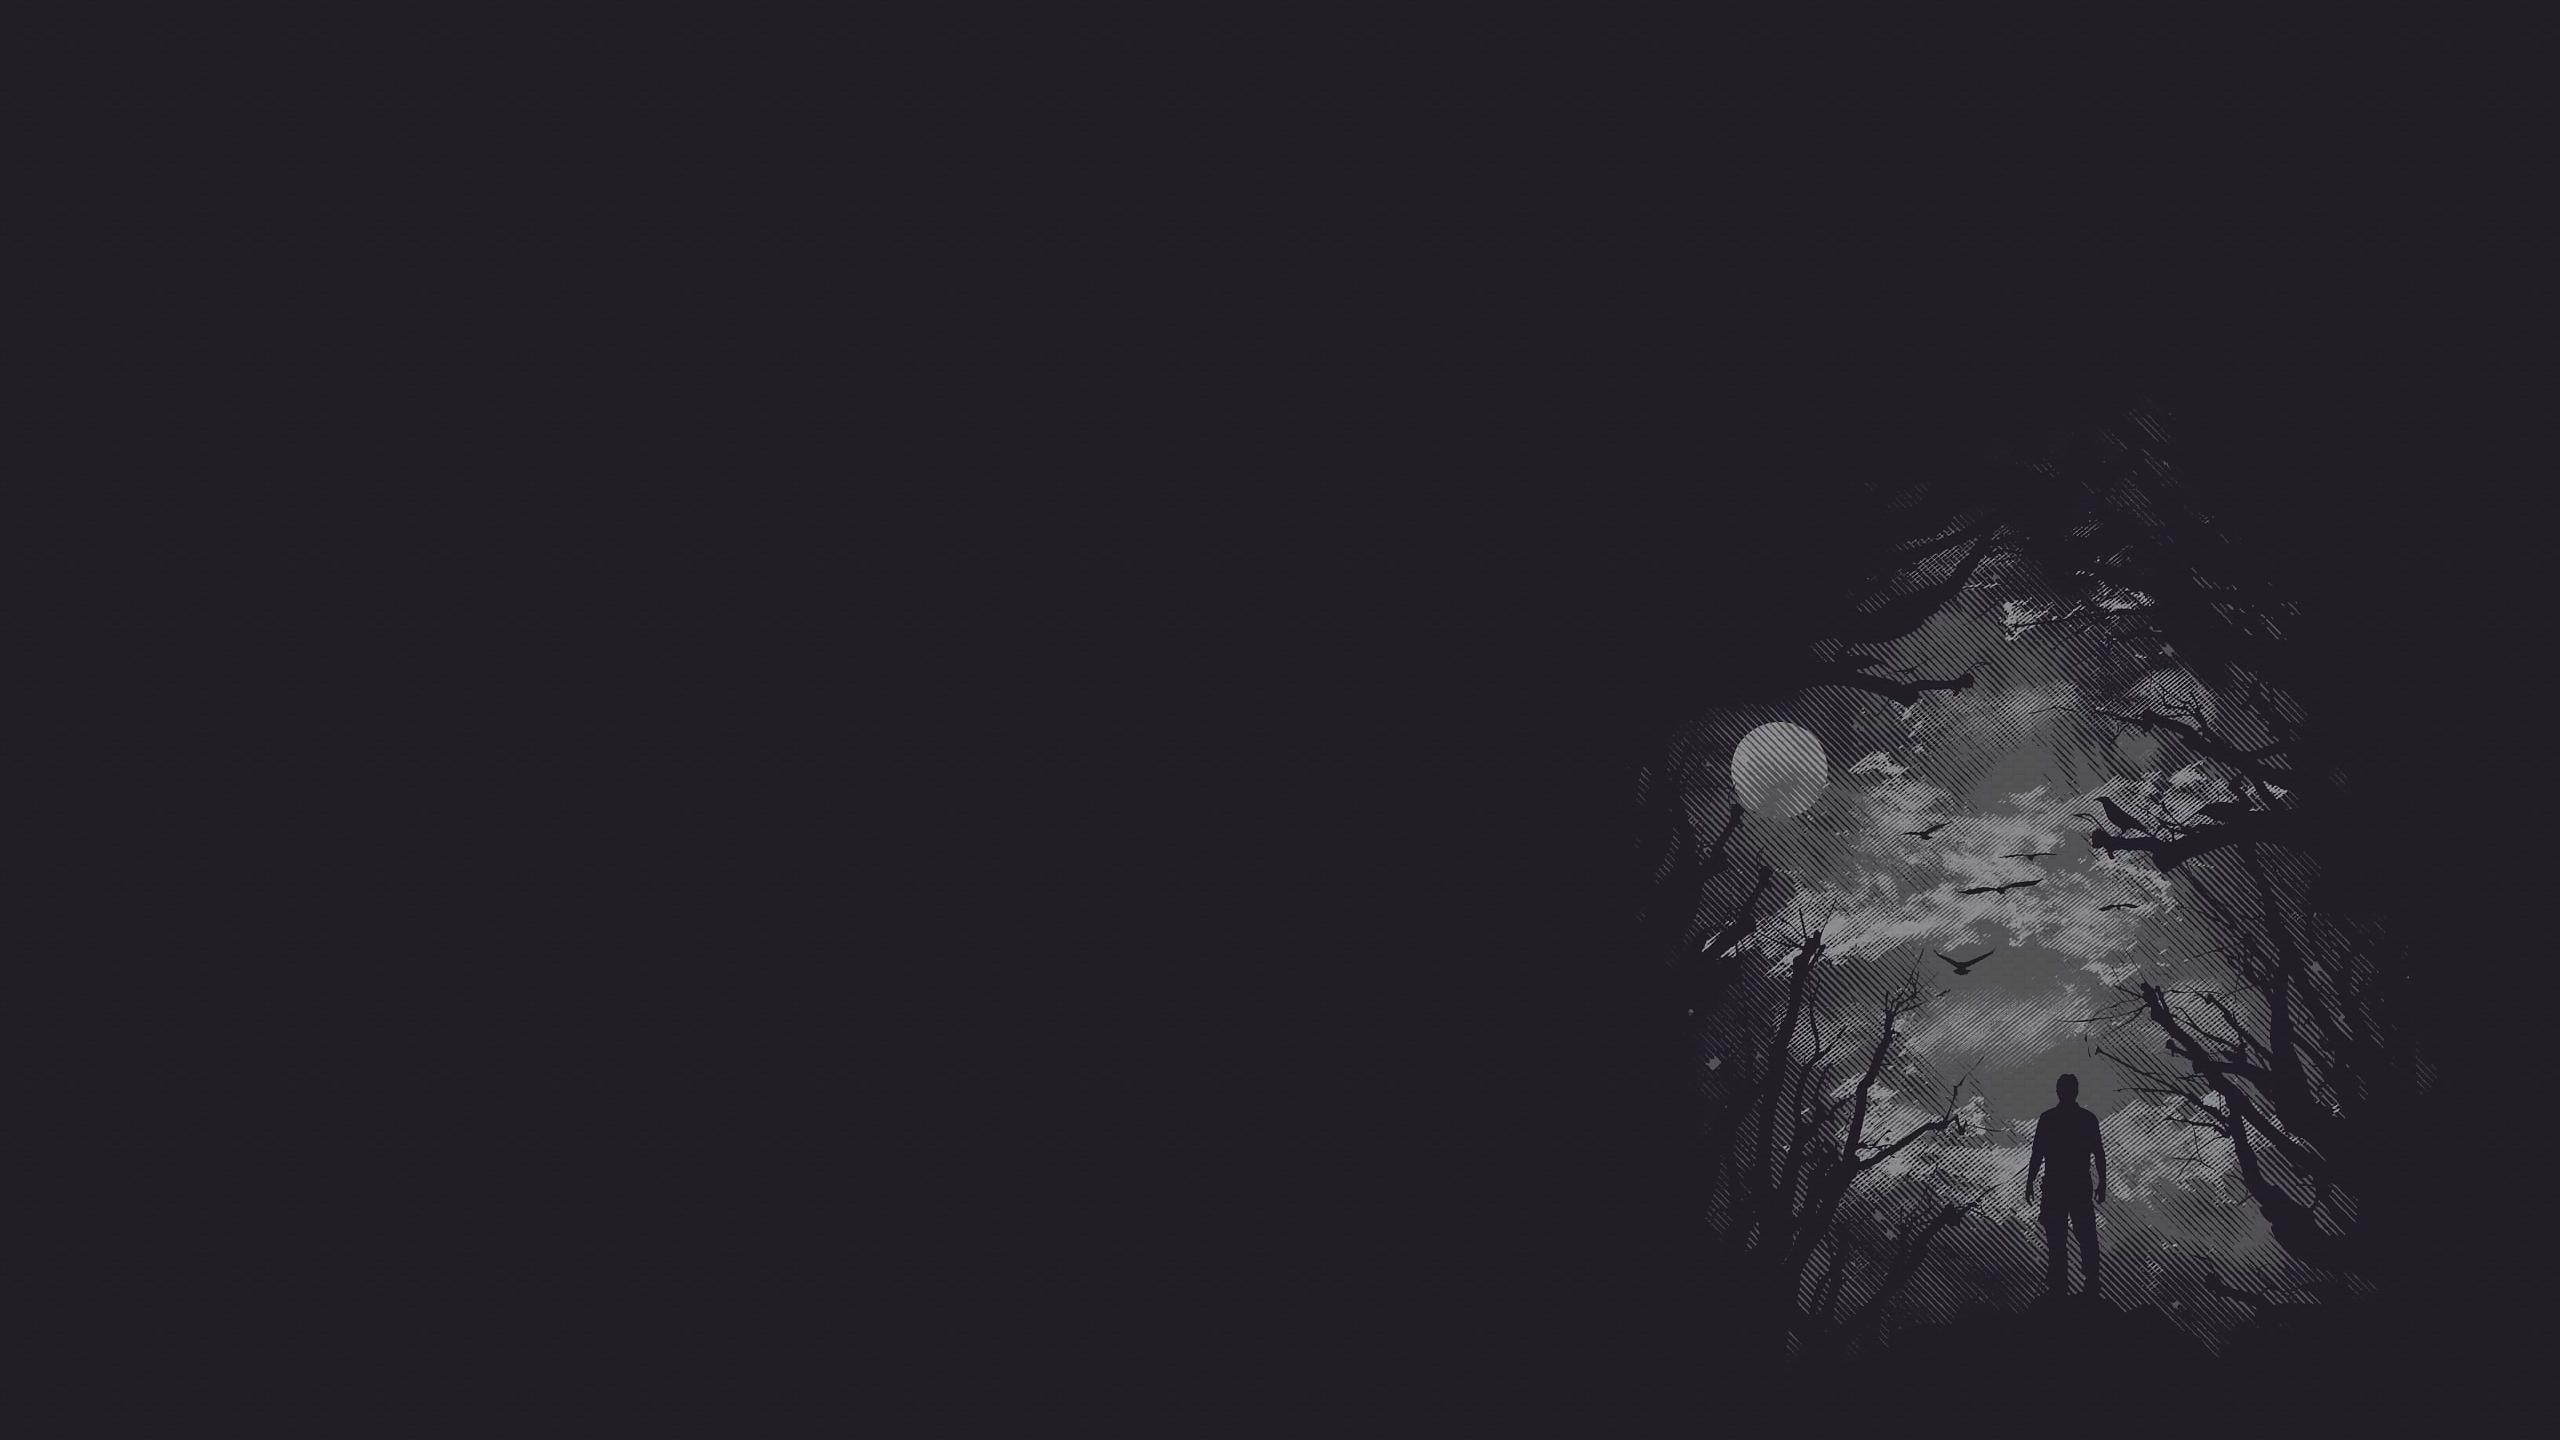 Halloween Night 2560x1440